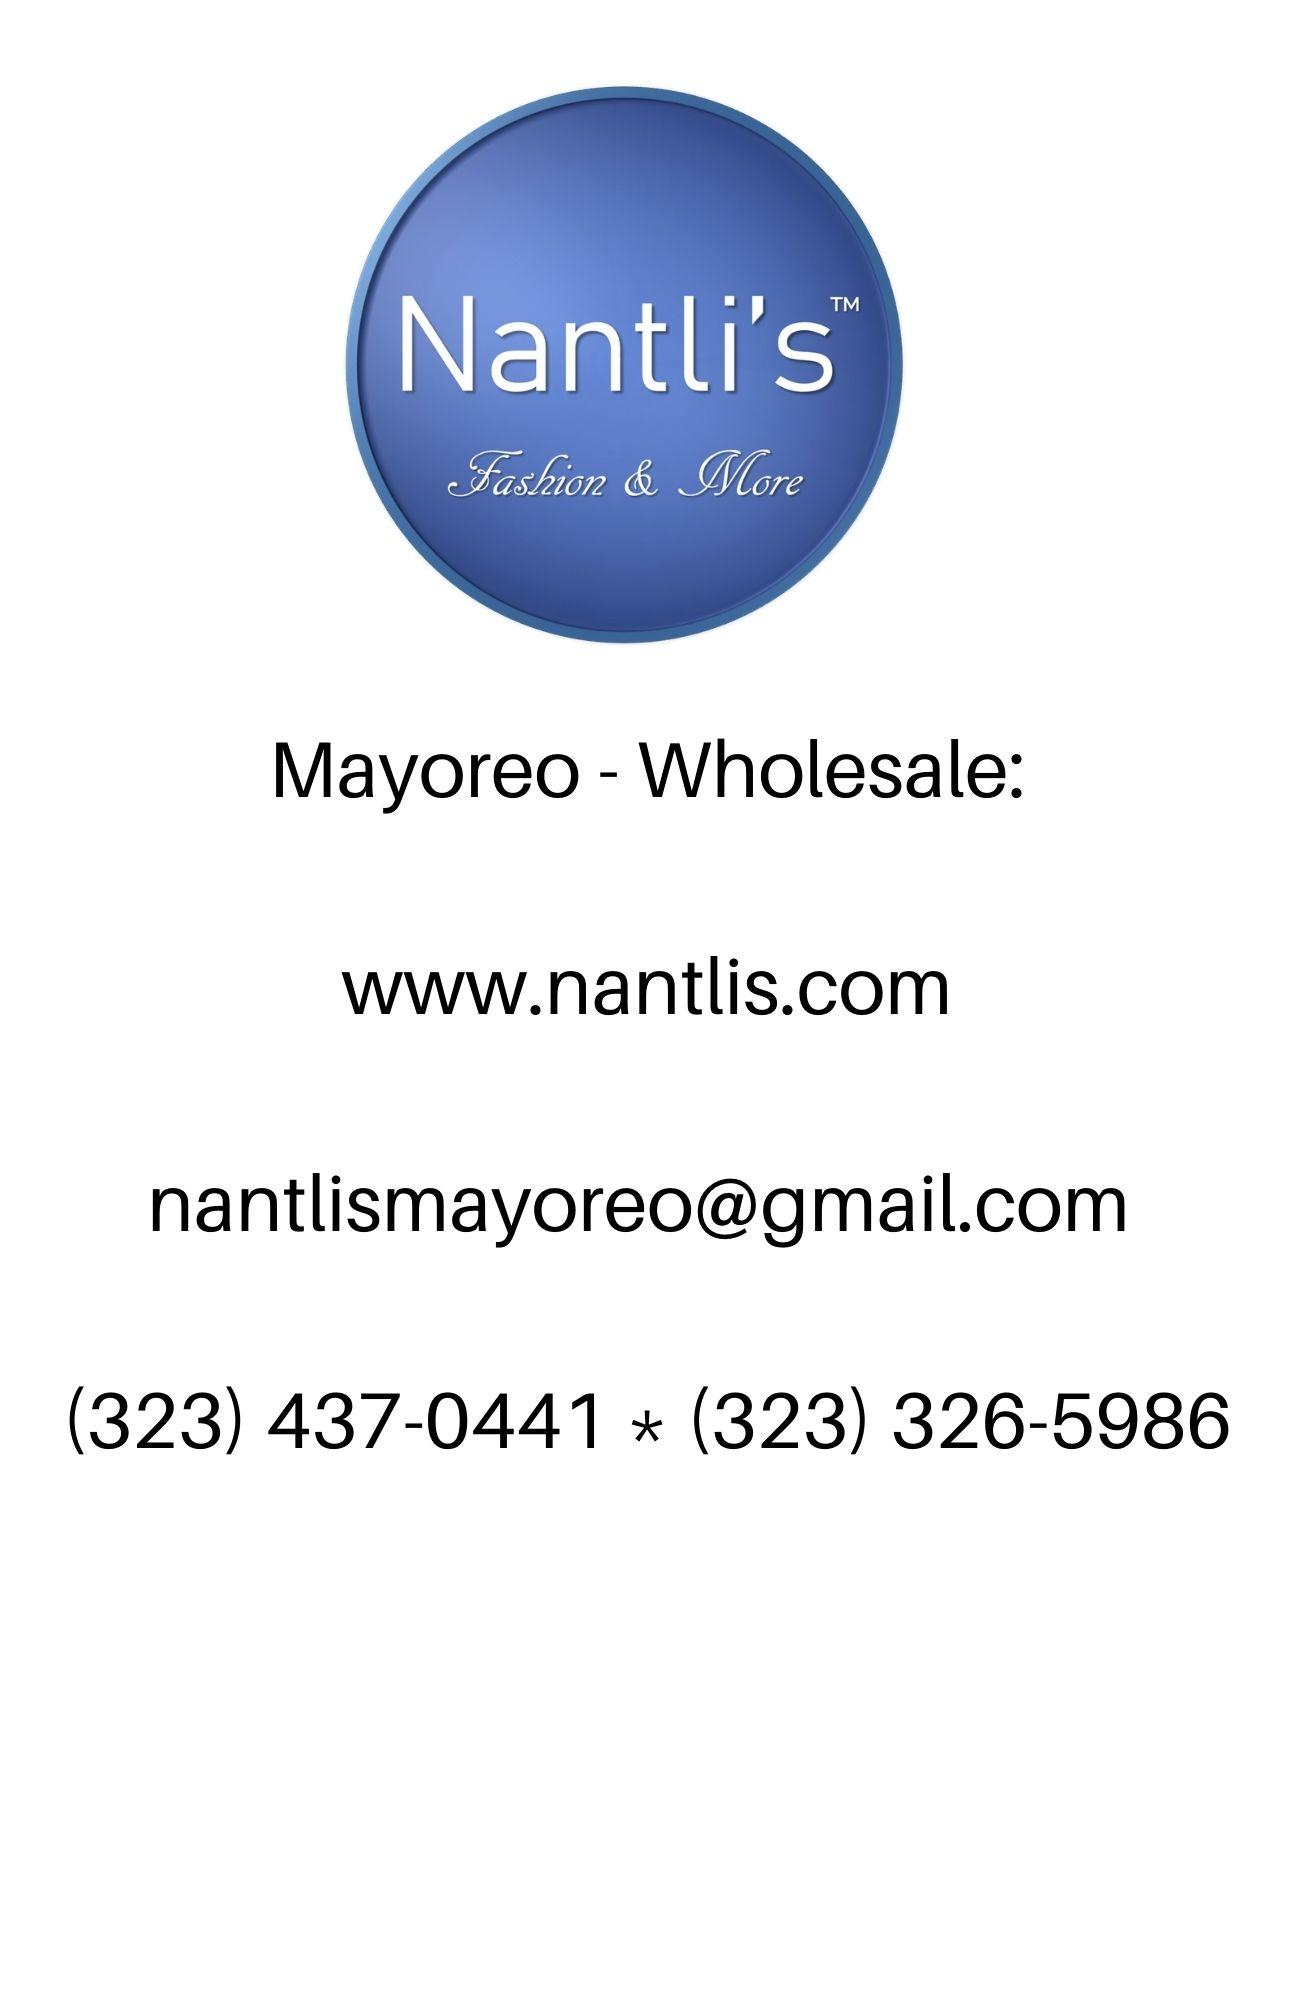 Catalogo Vol QU44 Sandalias de mujer mayoreo Wholesale Sandals page 10